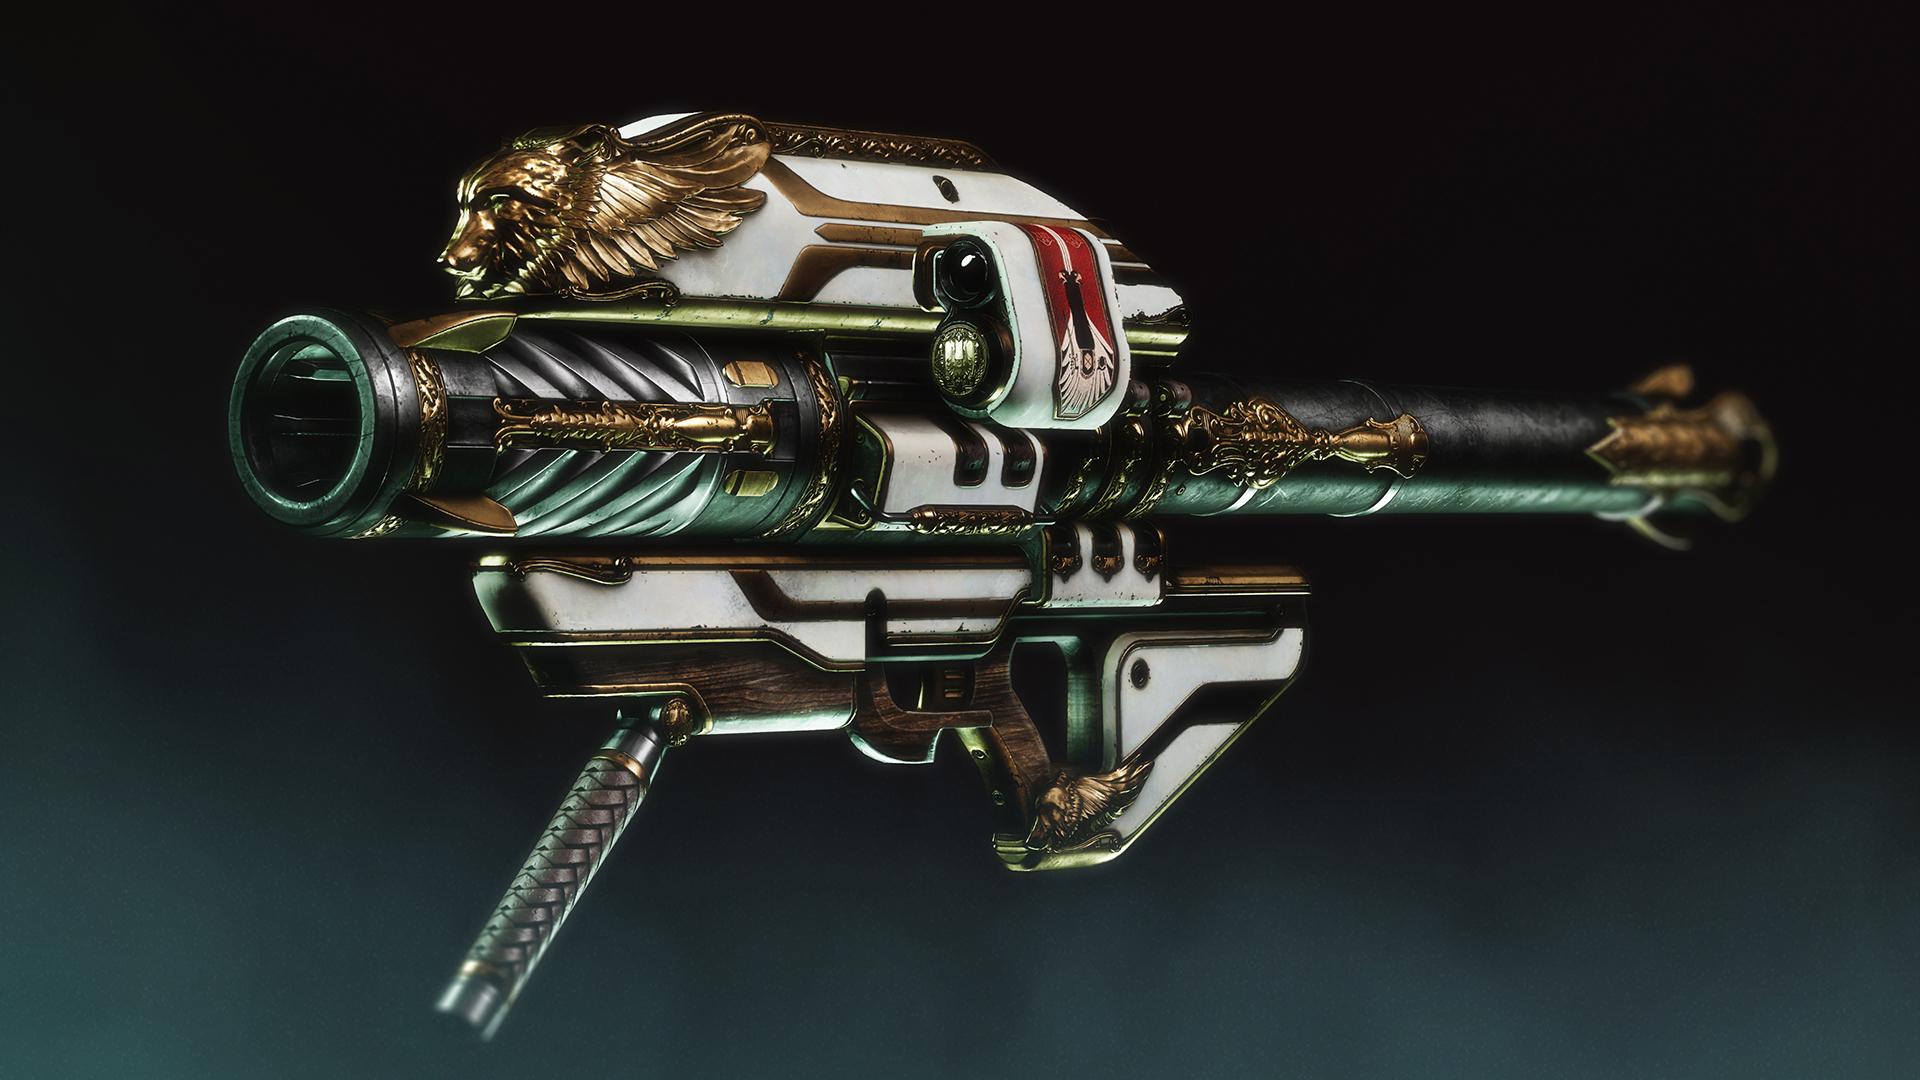 Gjallarhorn is coming to Destiny 2